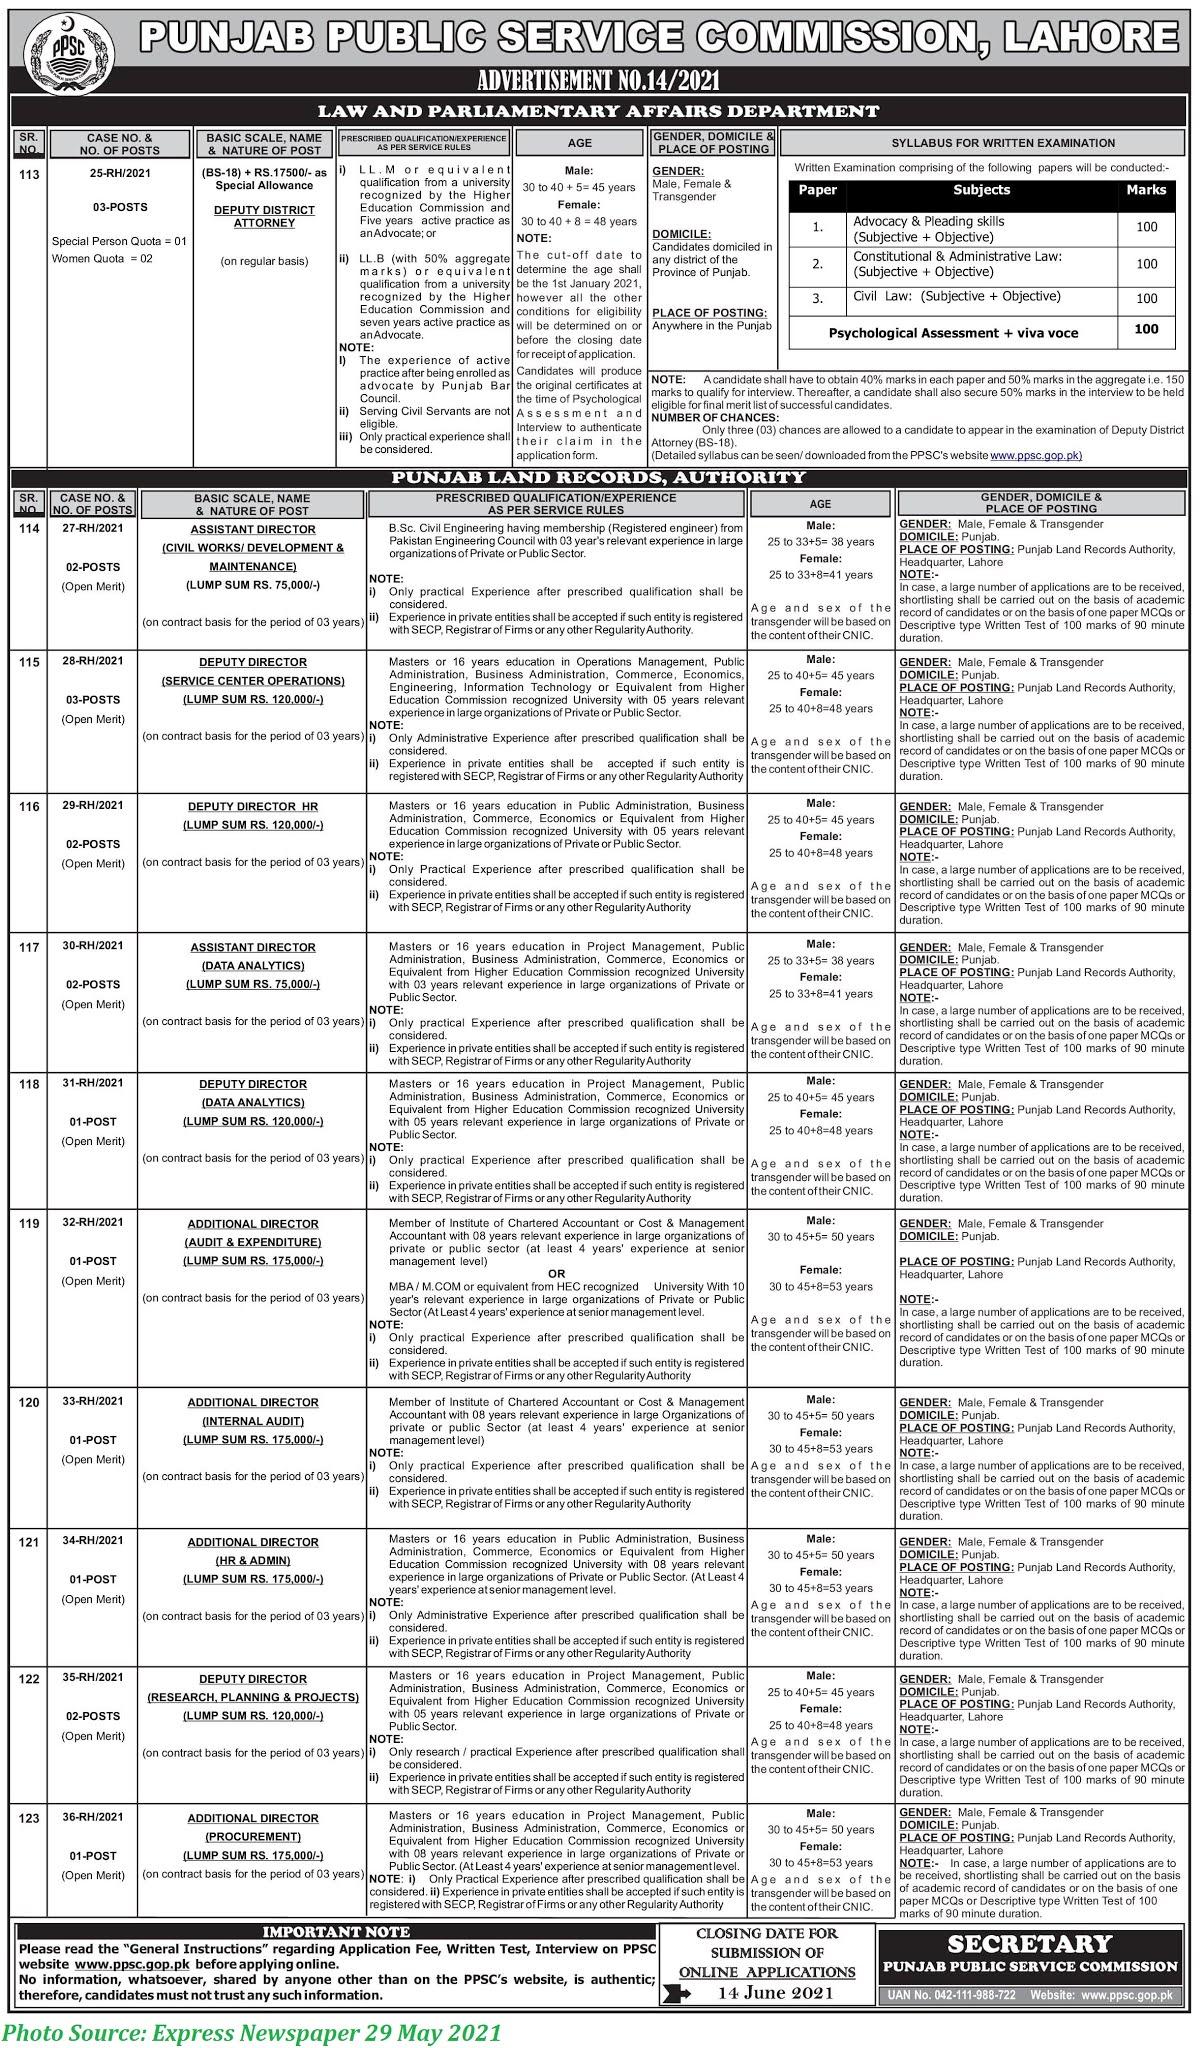 PPSC Jobs 2021 - Latest Jobs in Punjab Public Service Commission June 2021 Apply Online Latest PPSC Jobs 2021 Advertisement 14-2021